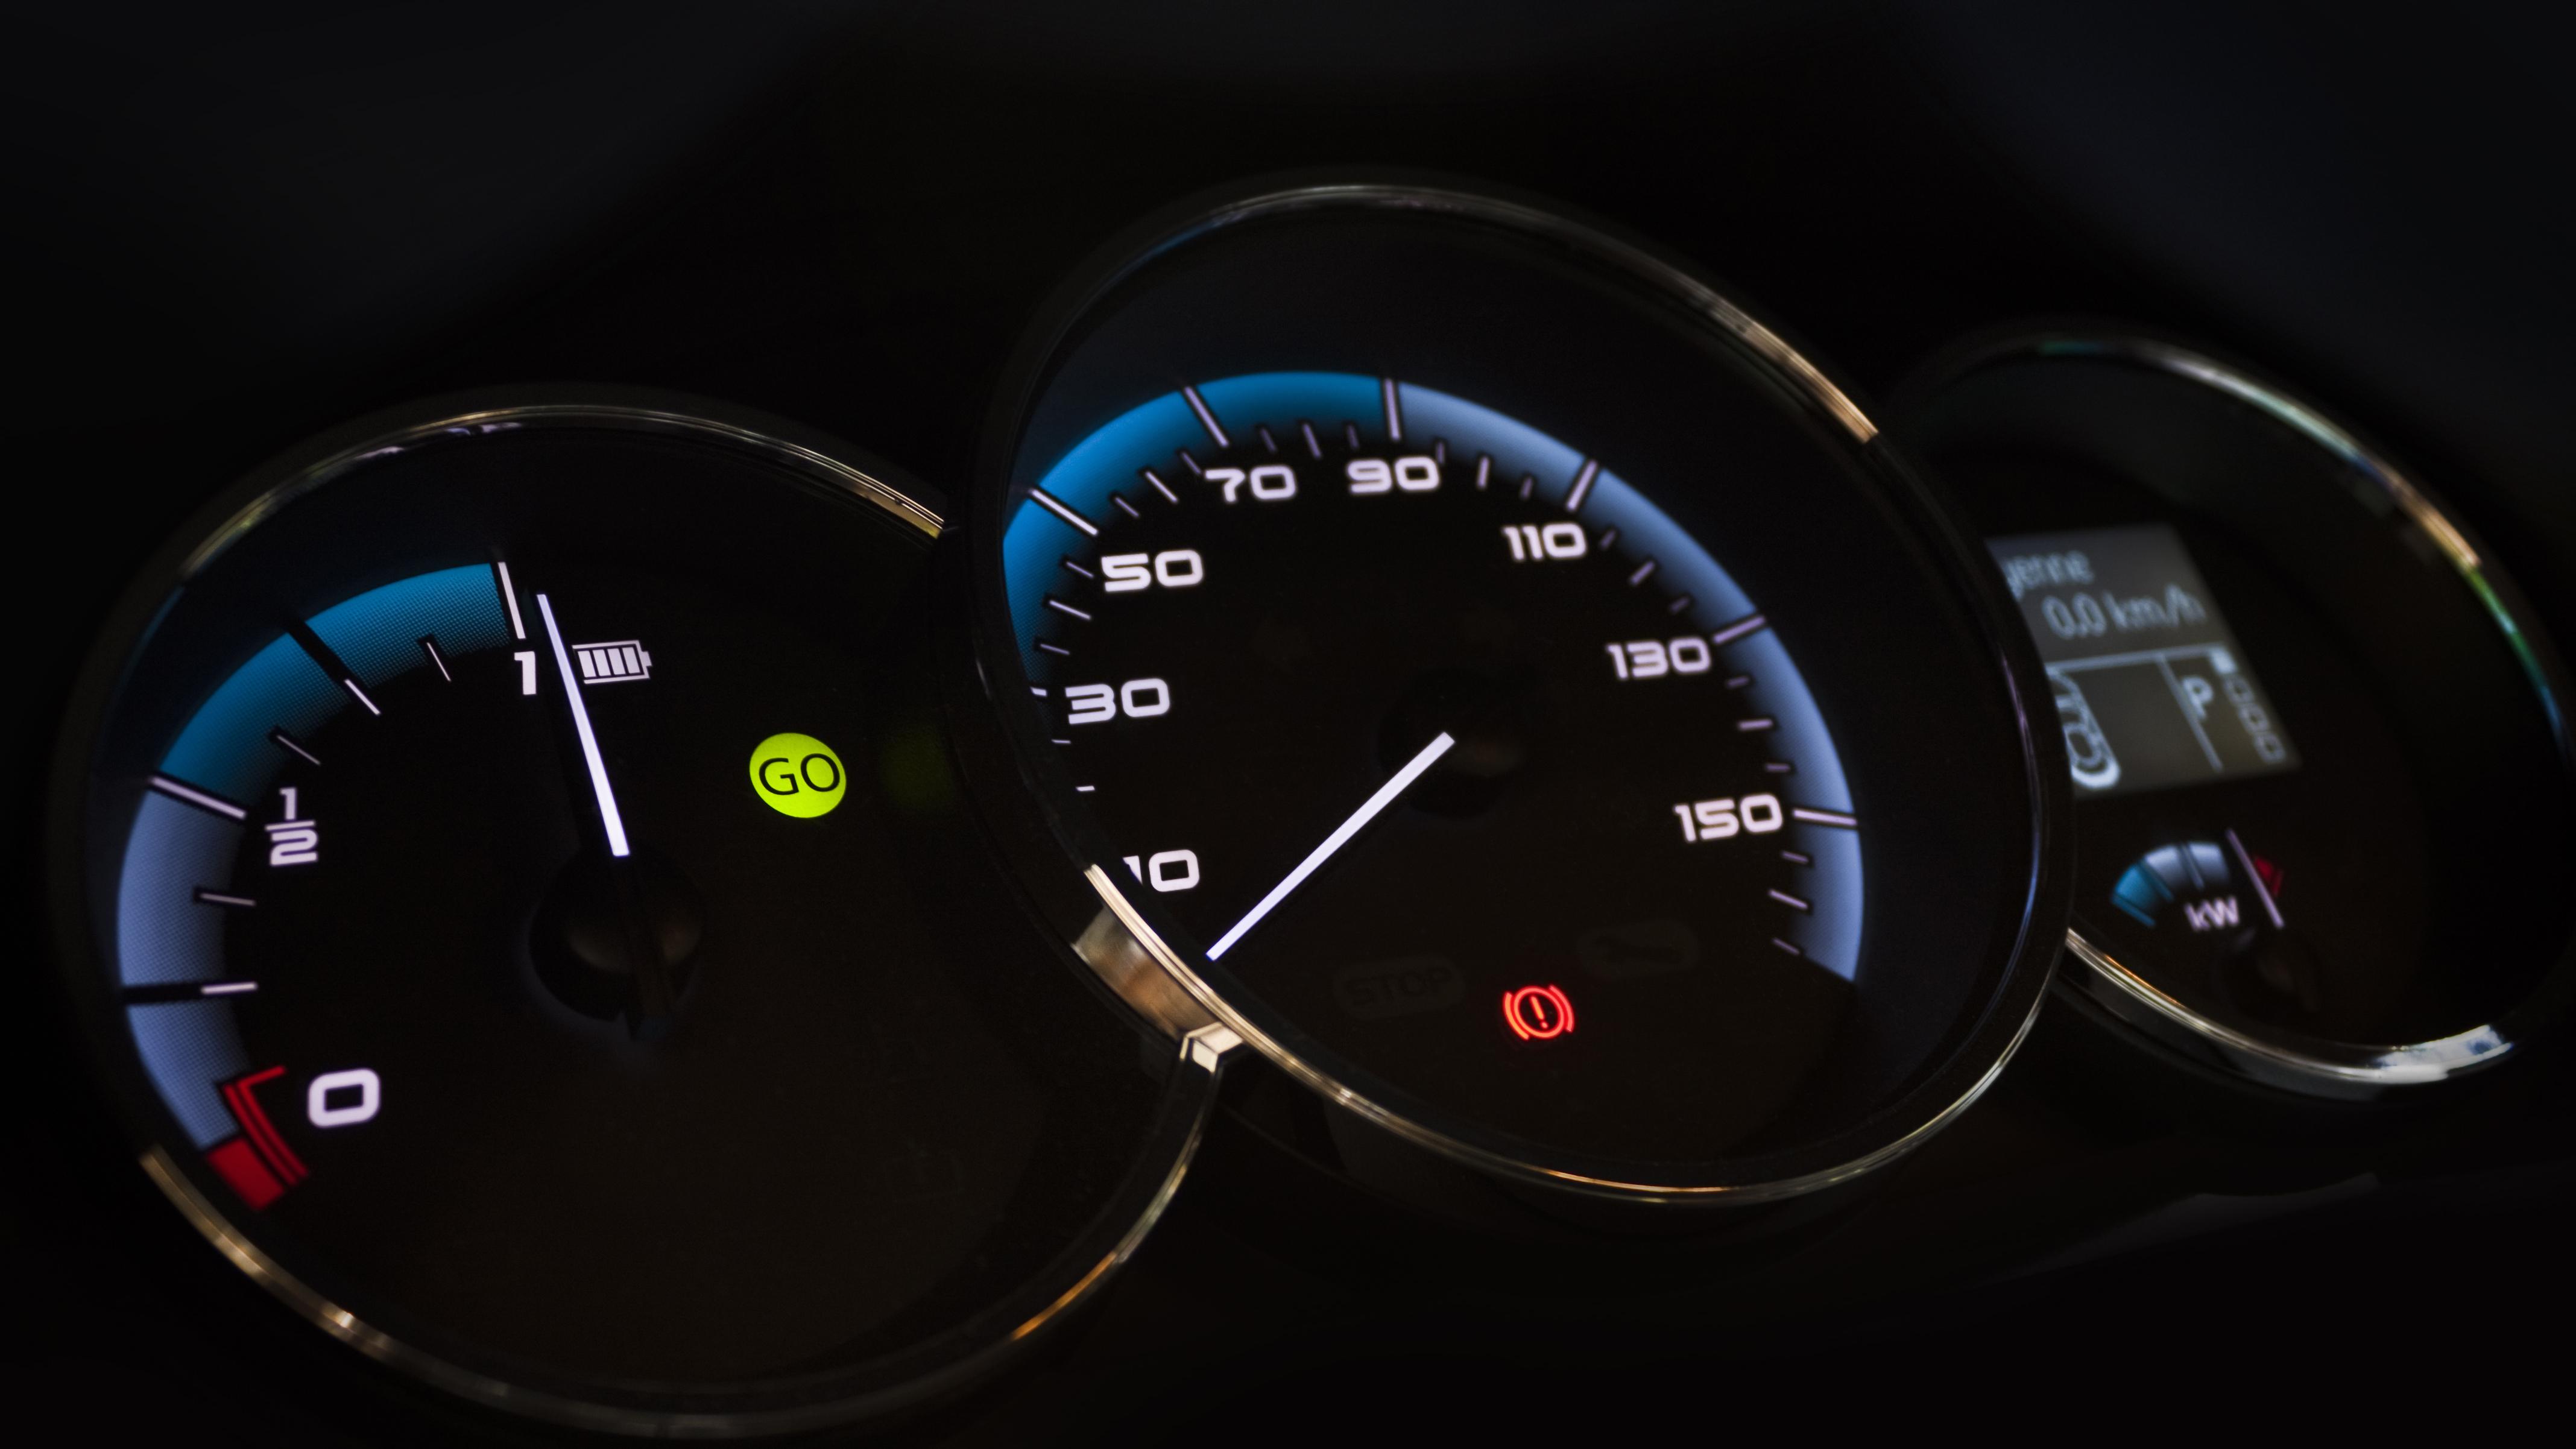 Car Dashboard Diagram Electric Car Warning Lights Dashboard Symbols Explained Buyacar